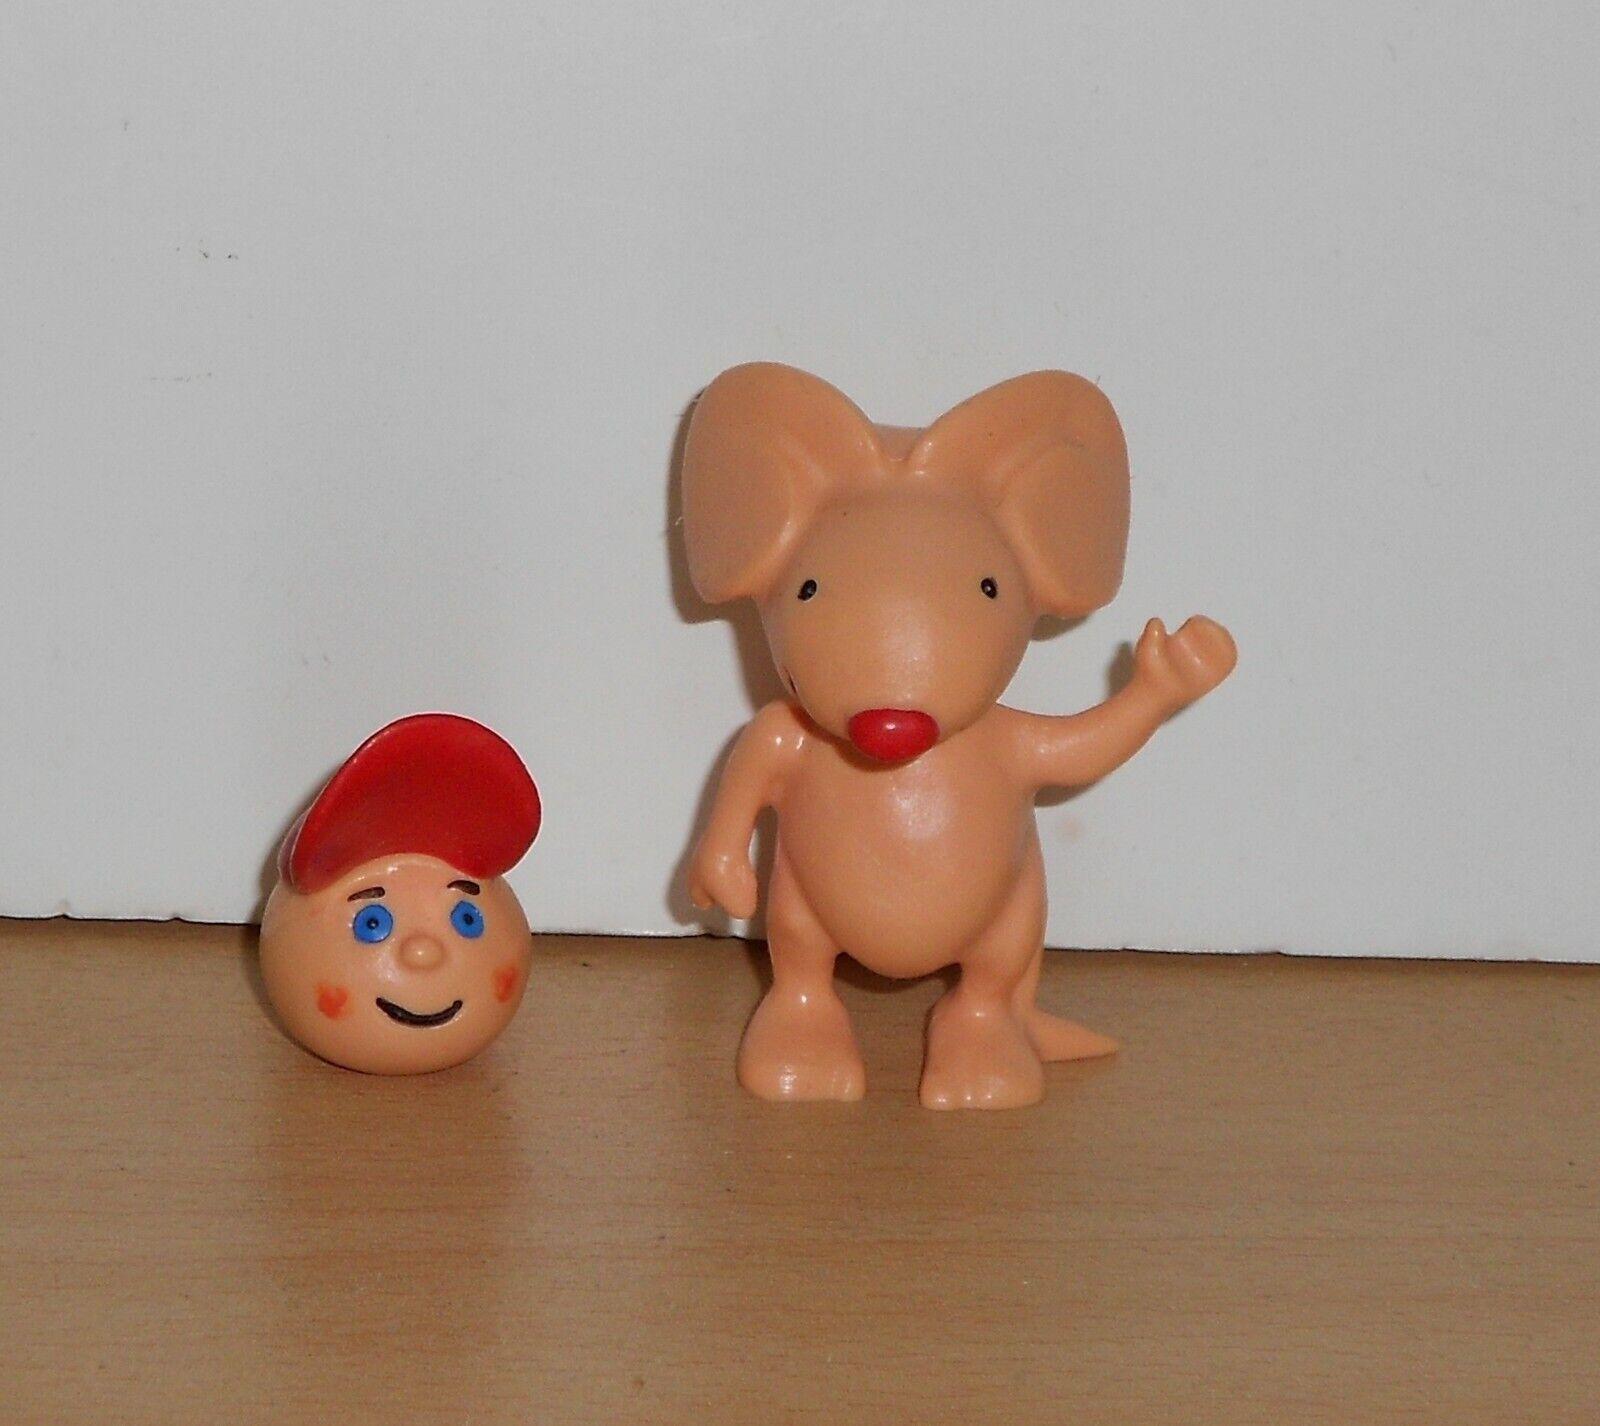 Vintage 2 toy figure Pepe & RoiRoi MOUSE BOY S. I. G. 2002 Figurine Maia Borges